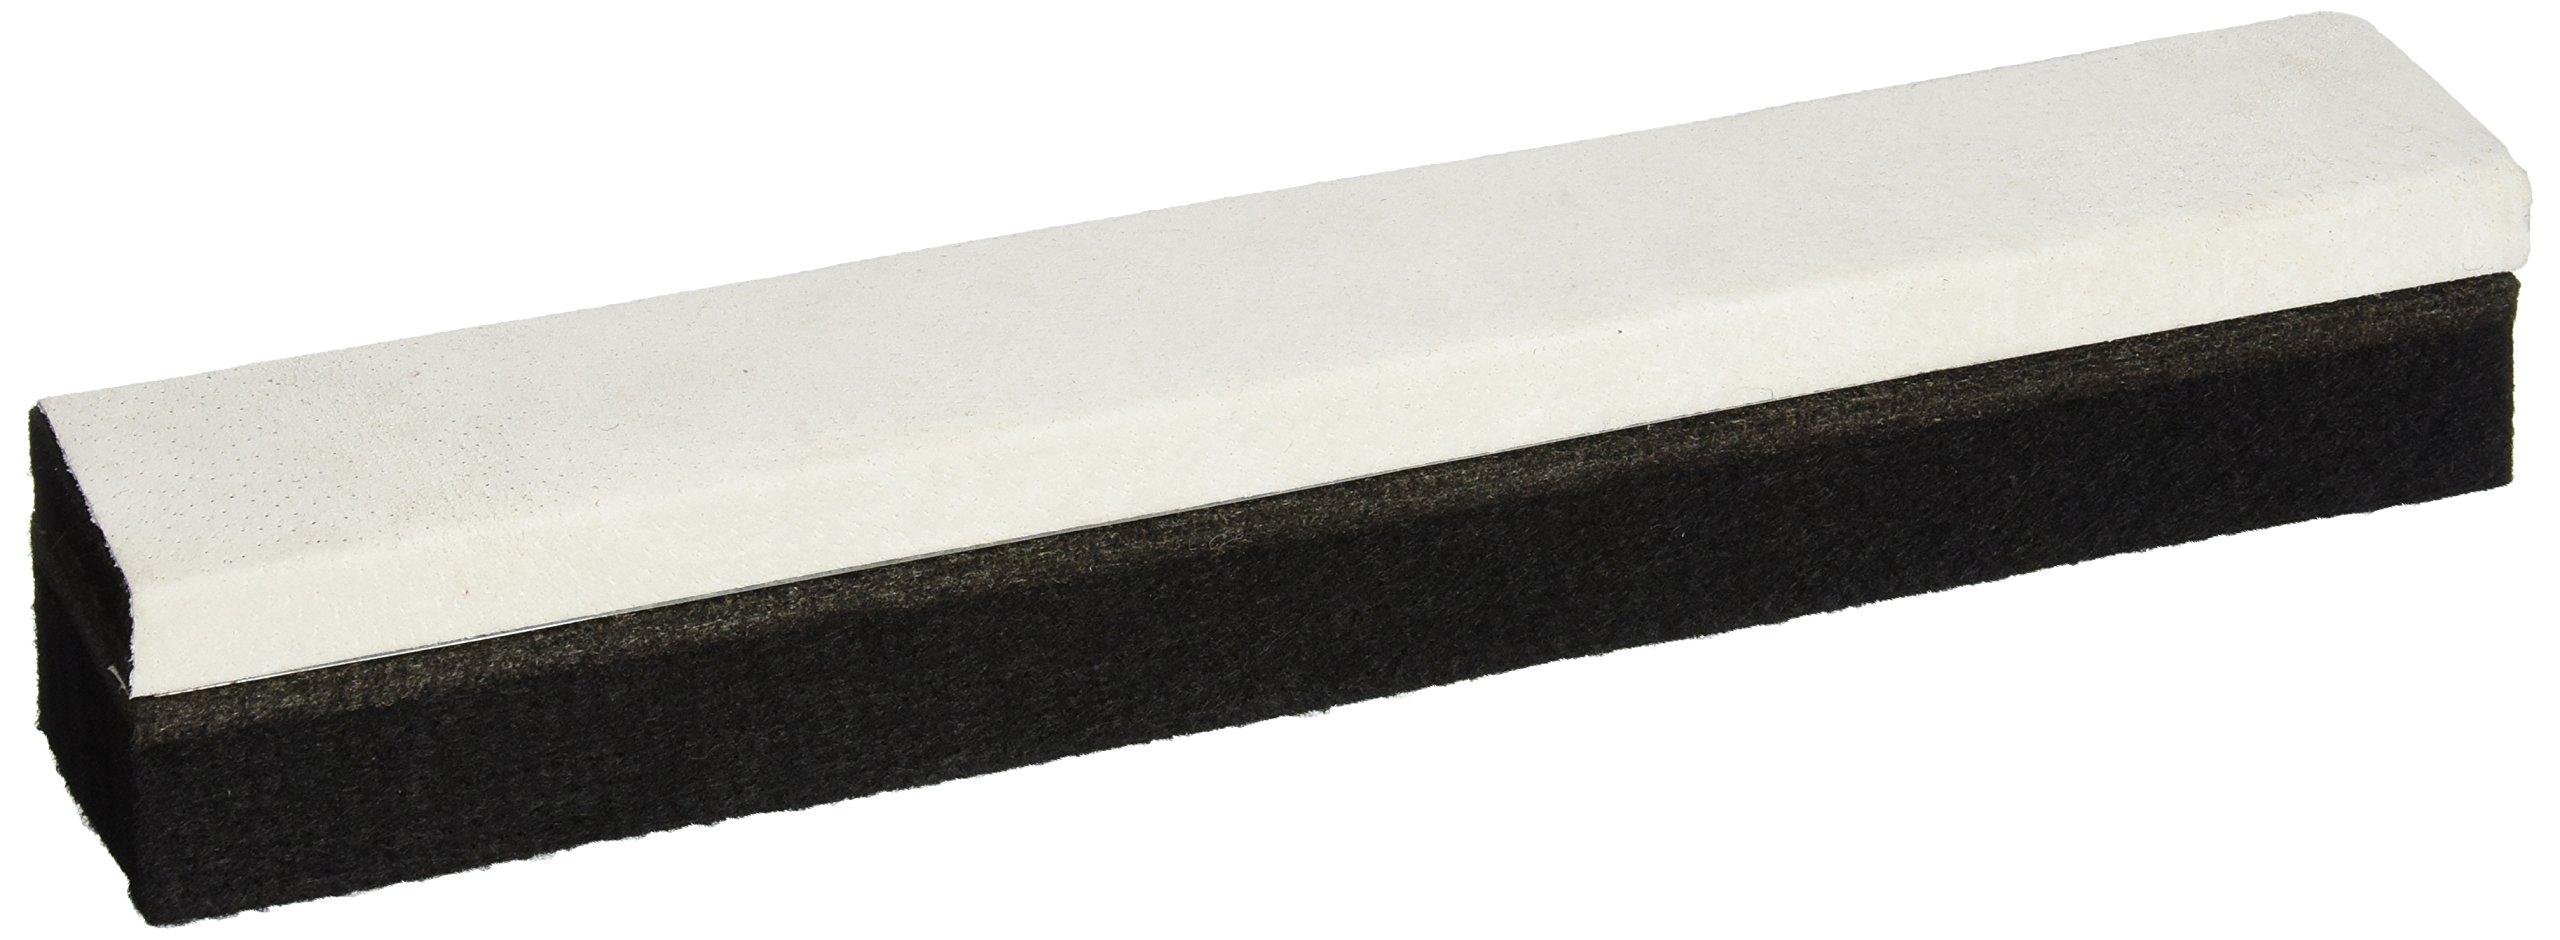 Quartet 807222 Deluxe Laminated Felt Chalkboard Eraser/Cleaner, 12 x 2 x 1-5/8